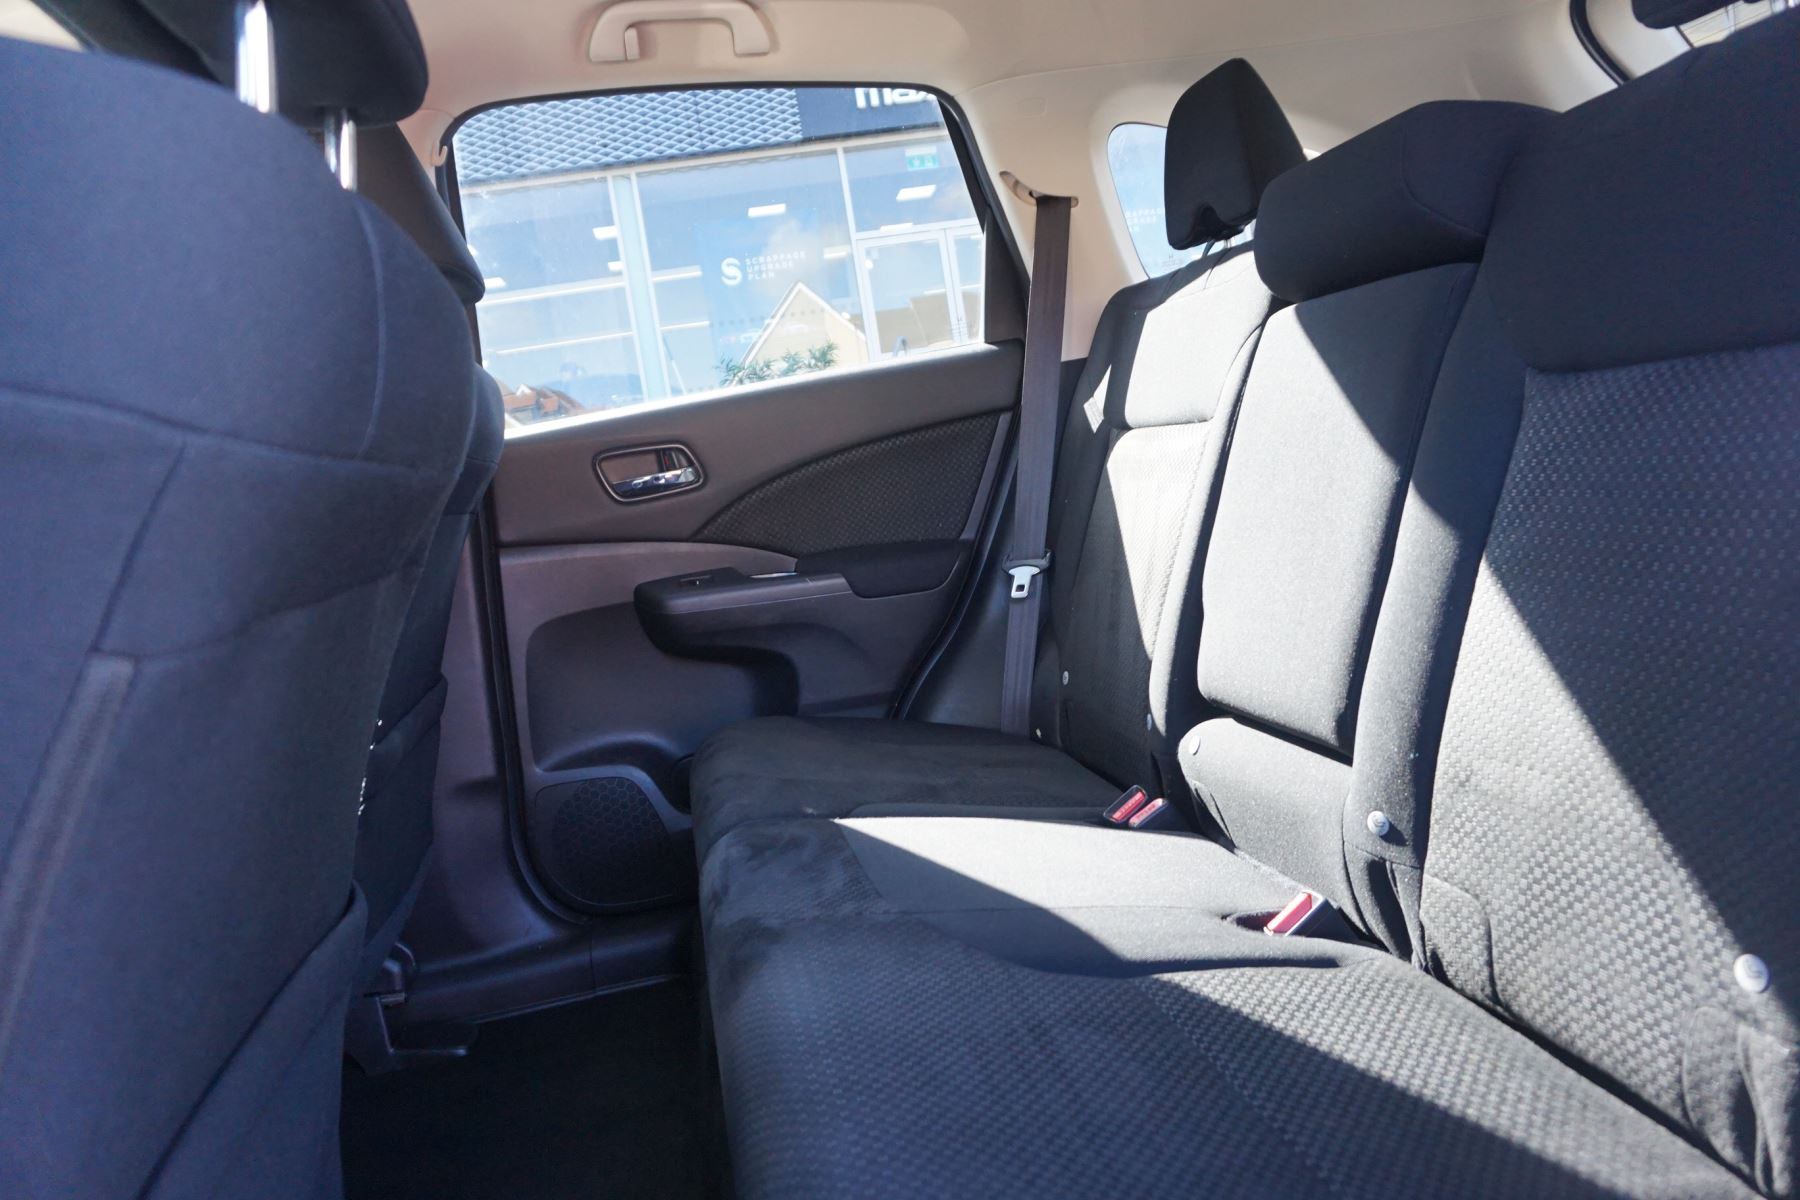 Honda CR-V 1.6 i-DTEC 160 SE Plus 5dr [Nav] 4WD image 9